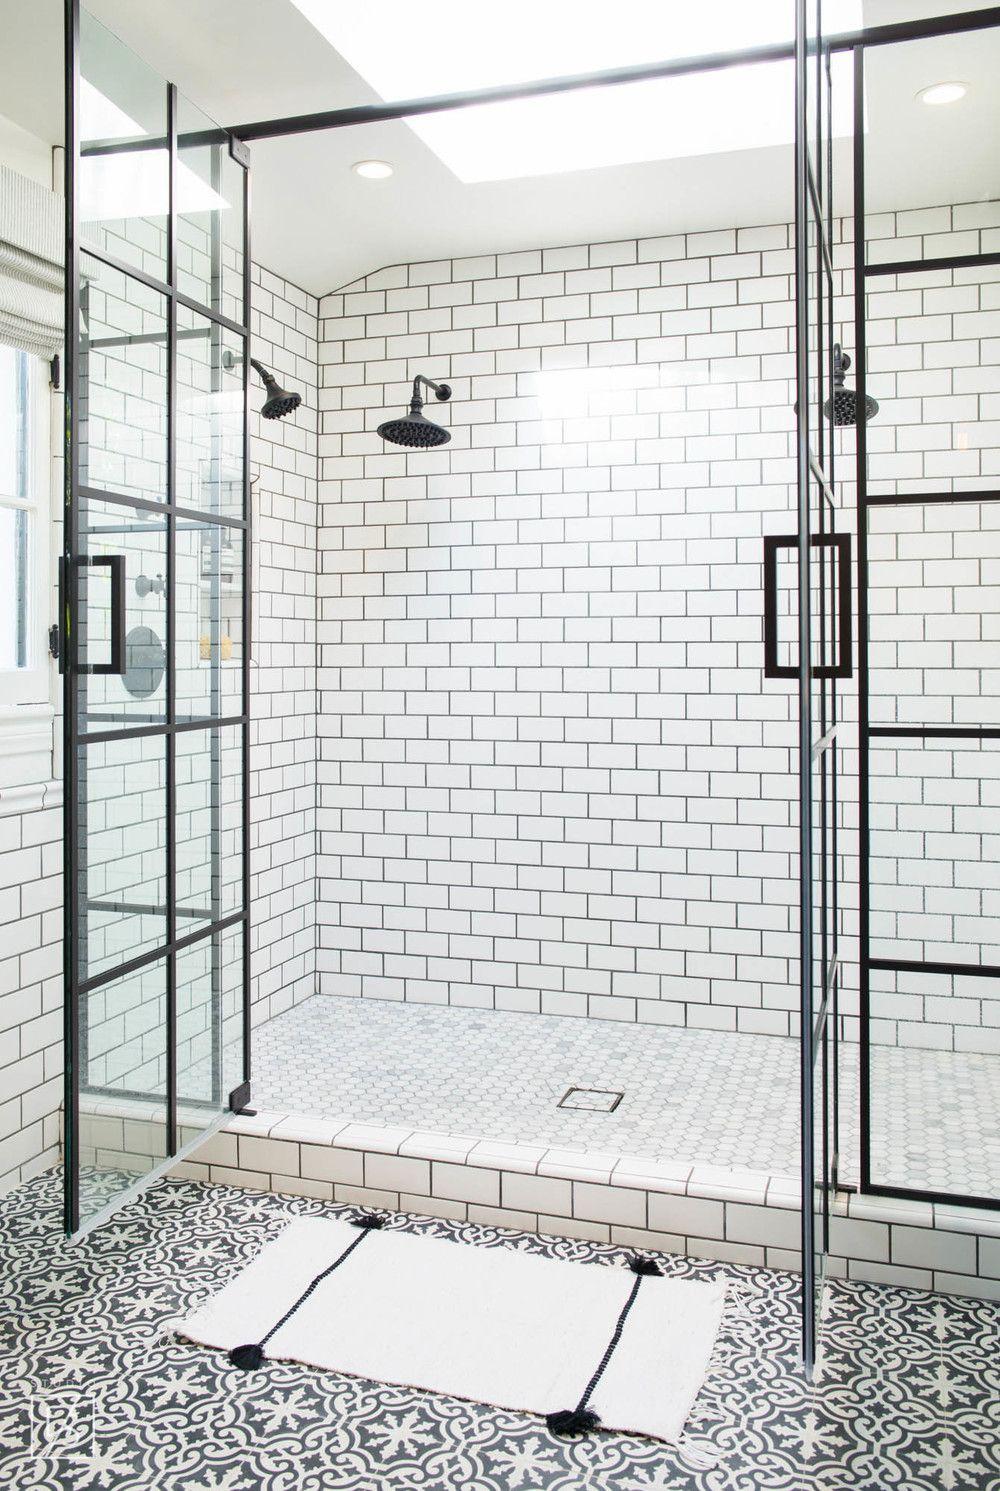 Carrelage Metro Blanc Joint Gris las palmas // decorative tile // white and black bathroom